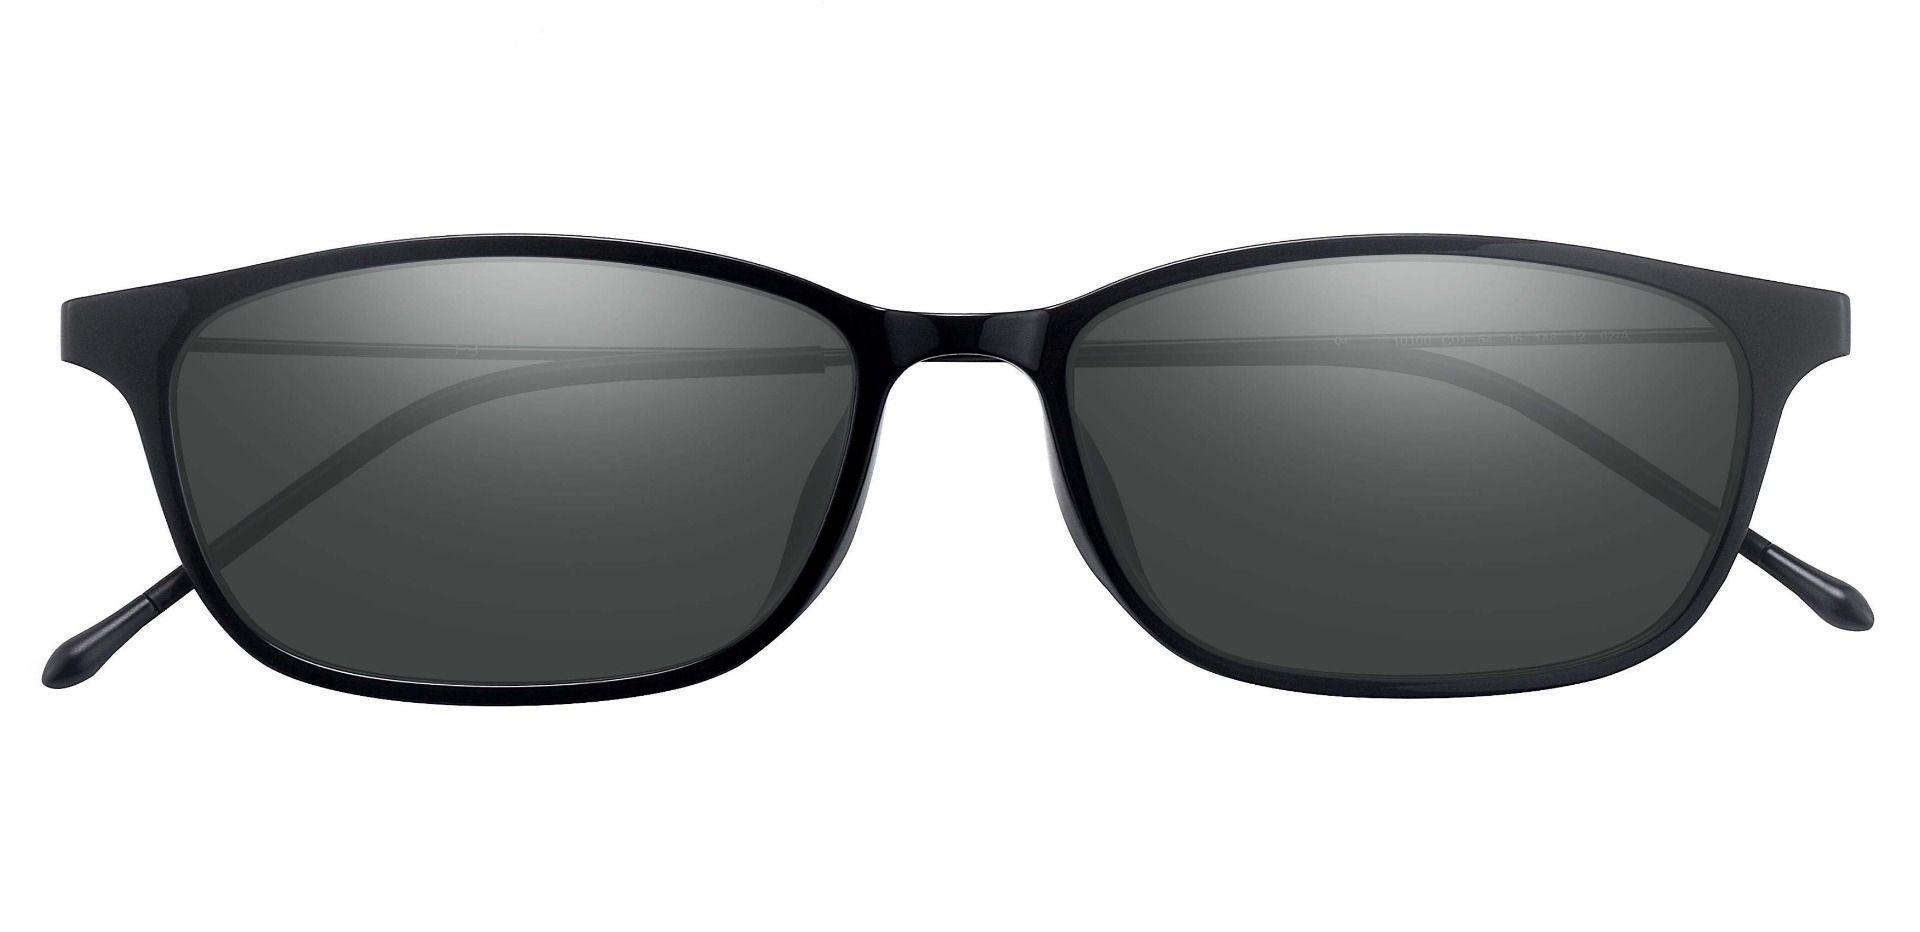 Vista Oval Prescription Sunglasses - Black Frame With Gray Lenses